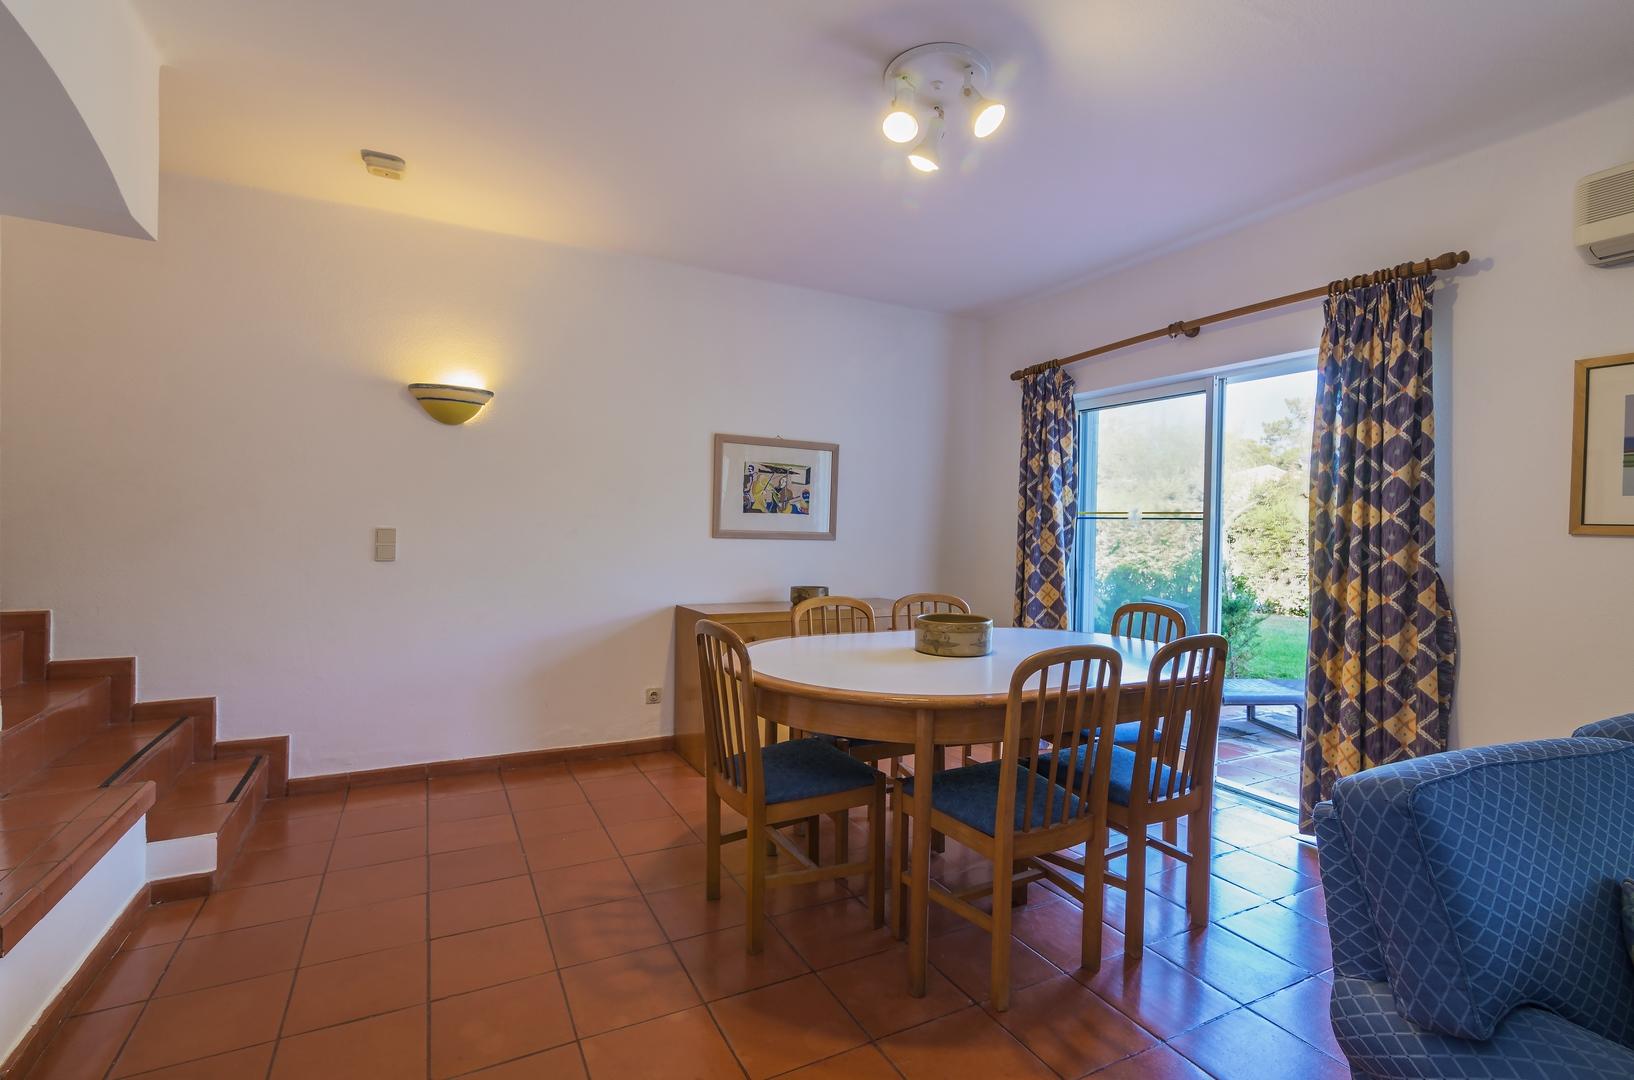 2 Bedroom Townhouse For Sale In Vilar do Golfe (4)